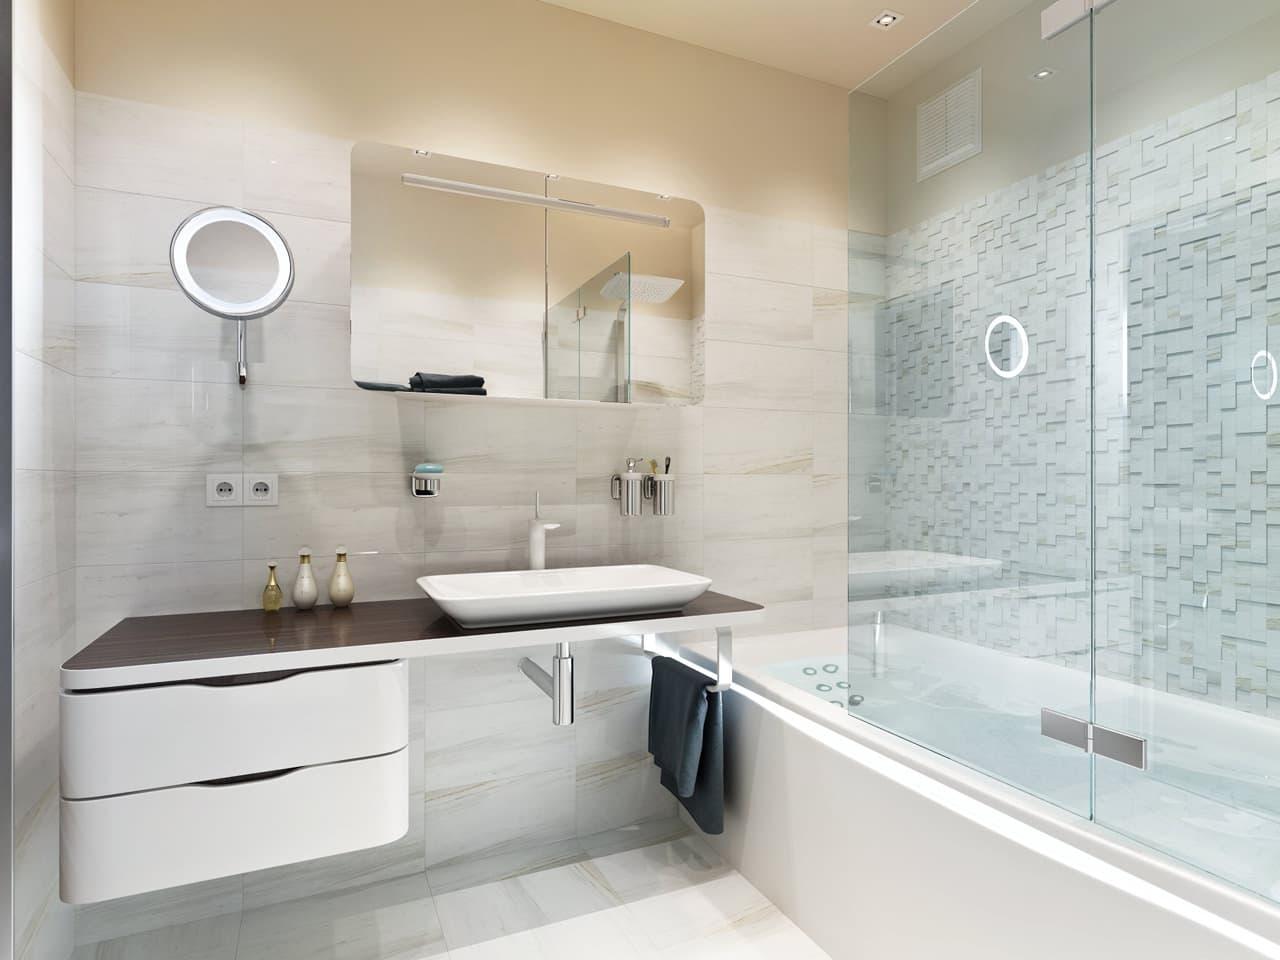 Decoraci n de interiores modernos construye hogar for Diseno de interiores dibujos